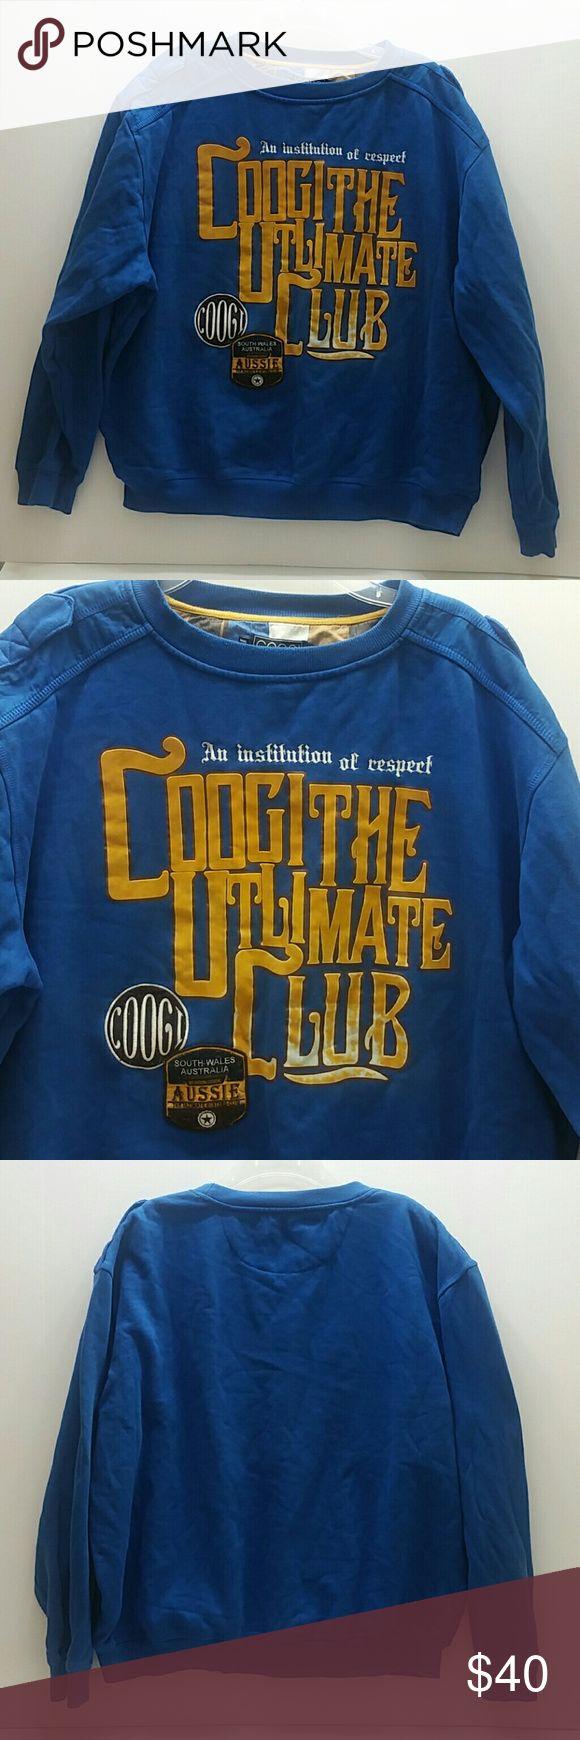 COOGI VINTAGE CREWNECK SWEATSHIRT VERY CLEAN INSIDE-OUT   PRICE FIRM   SKE # FGPO COOGI Shirts Sweatshirts & Hoodies